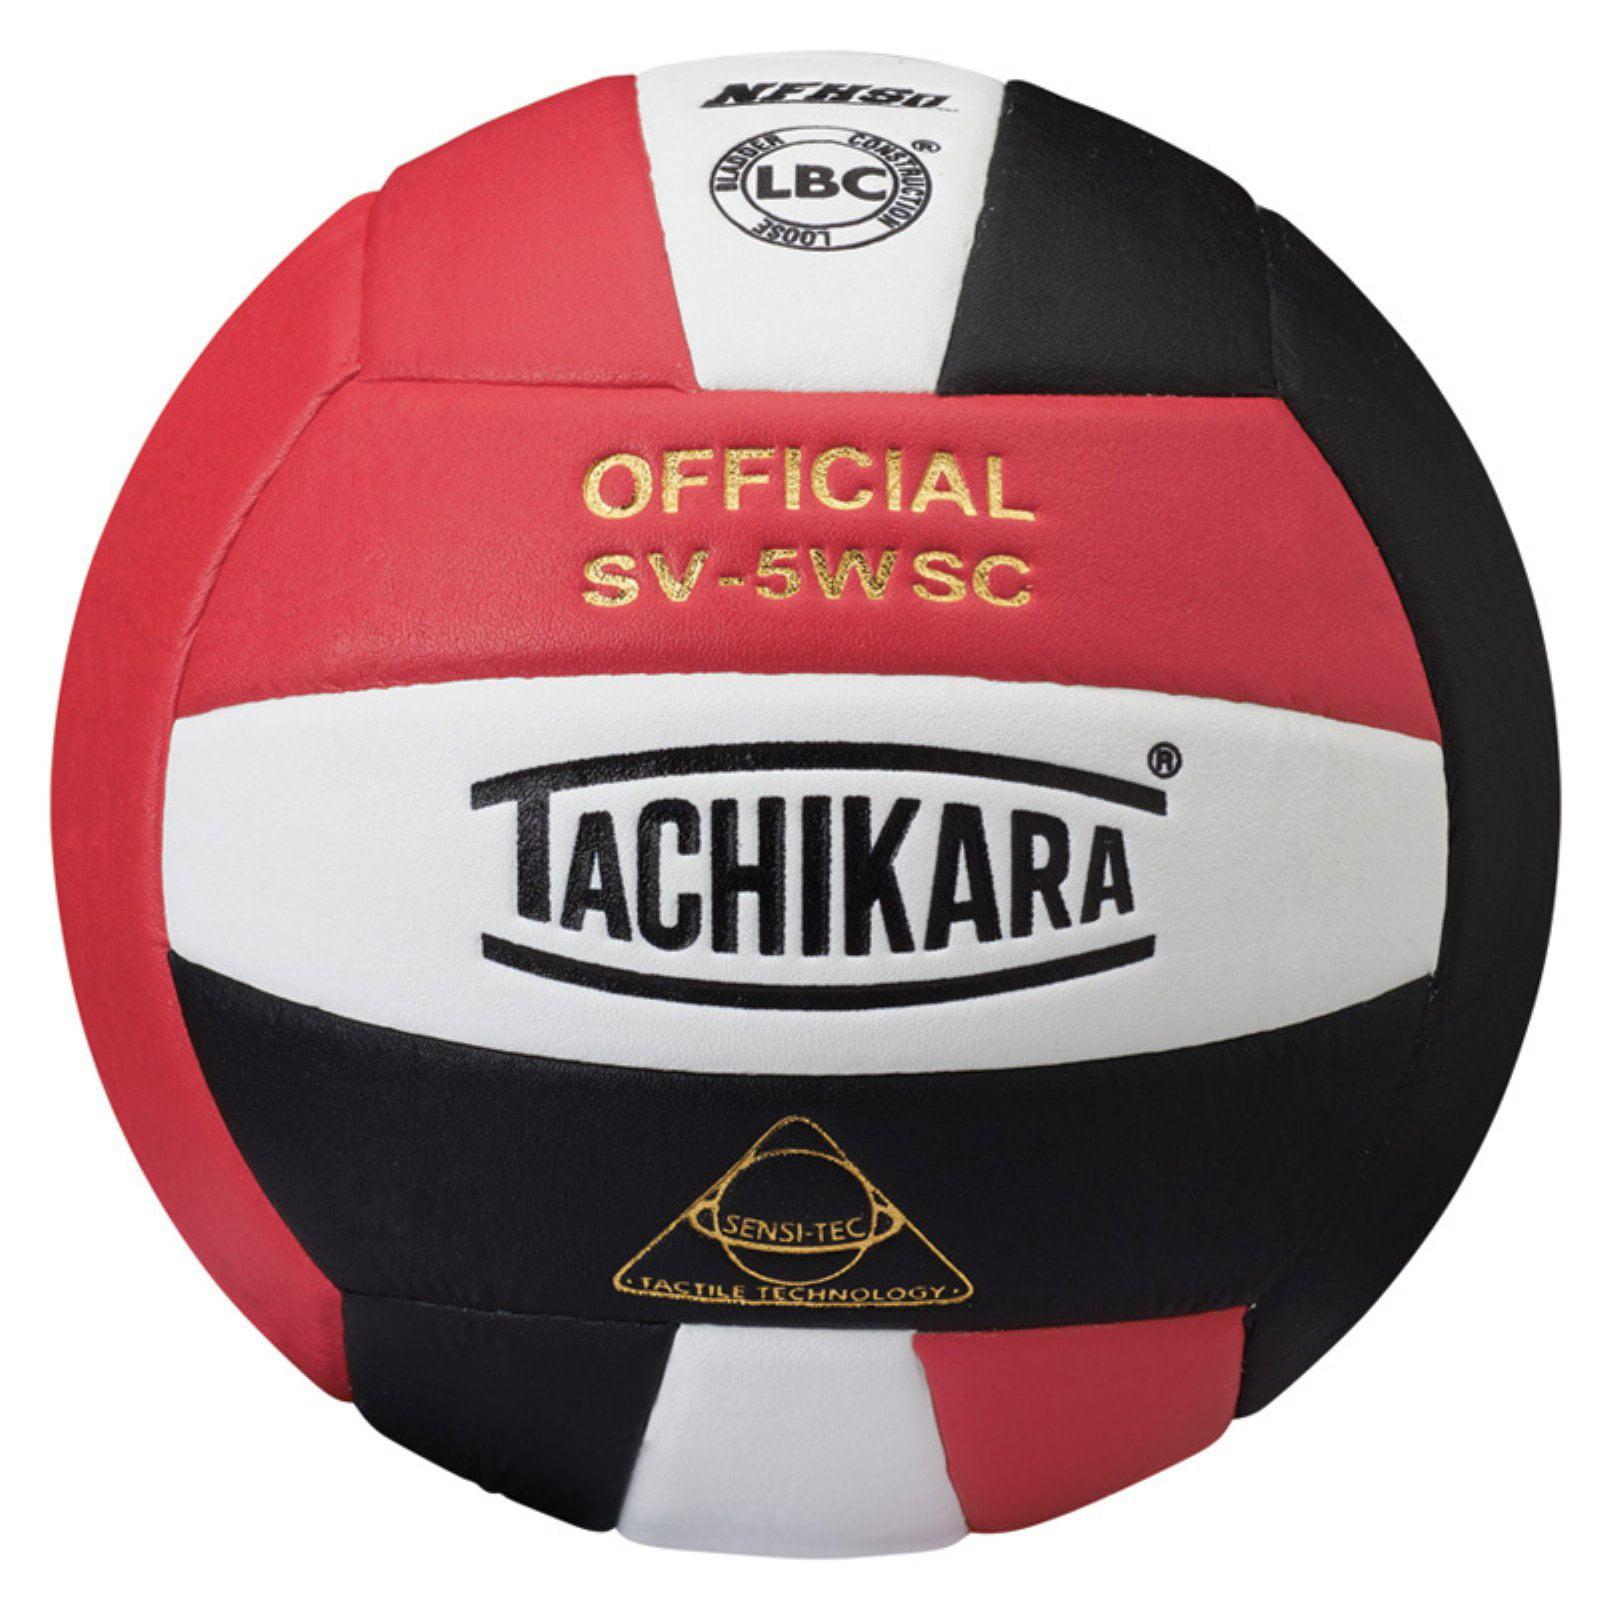 Tachikara SV5WC Red, White and Black Volleyball